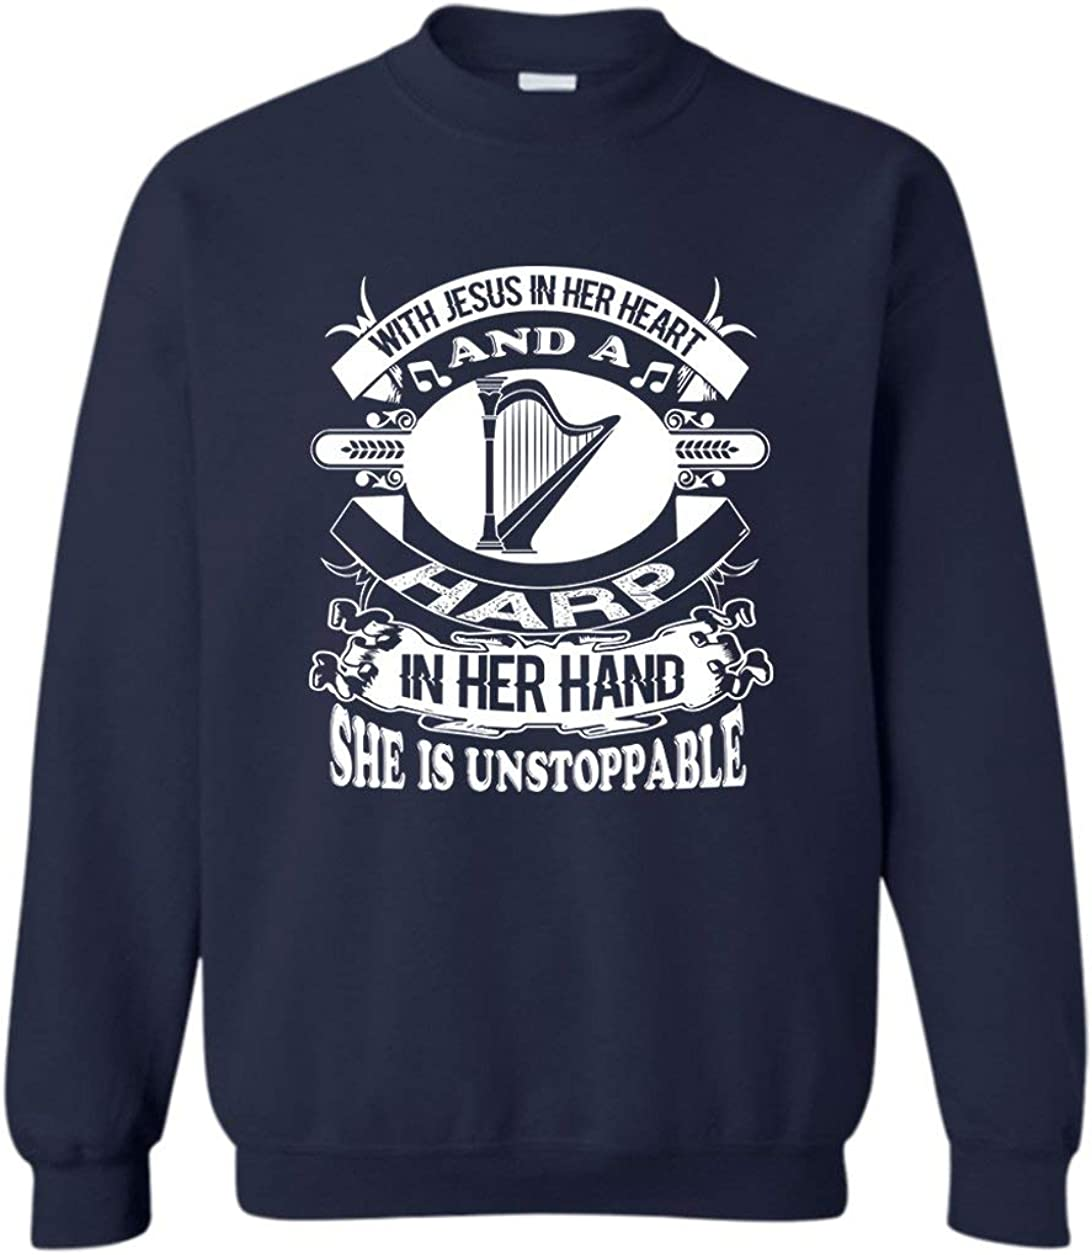 Girl Loves Harp and Jesus Men Women Award Sweatshirt Shir Long Sleeve Max 40% OFF